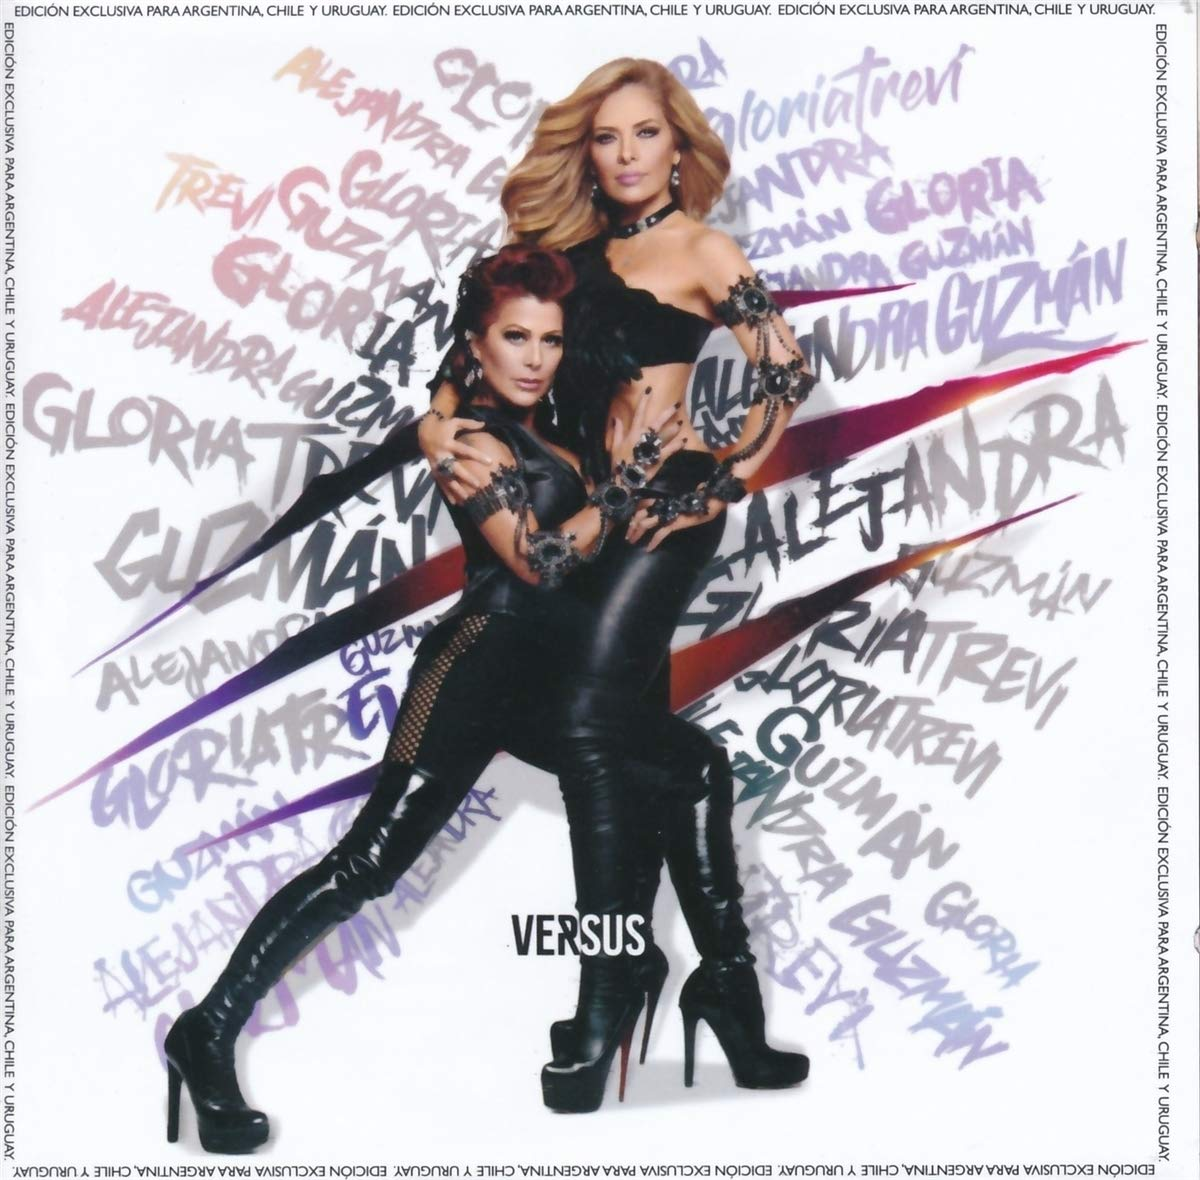 Versus   Gloria Trevi, Alejandra Guzmán Amazon.de Musik CDs & Vinyl